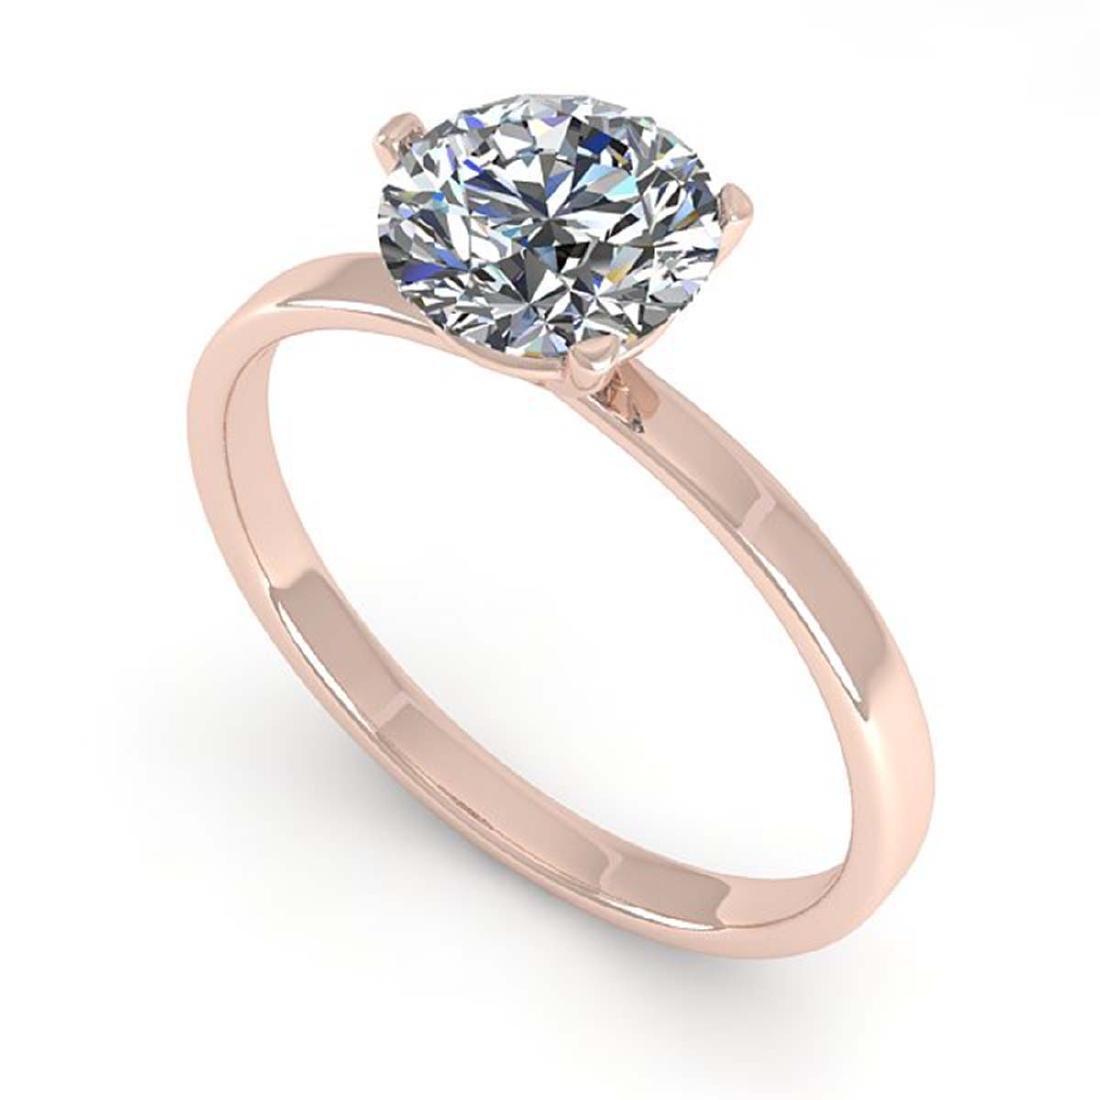 1.01 CTW Certified VS/SI Diamond Engagement Ring 14K